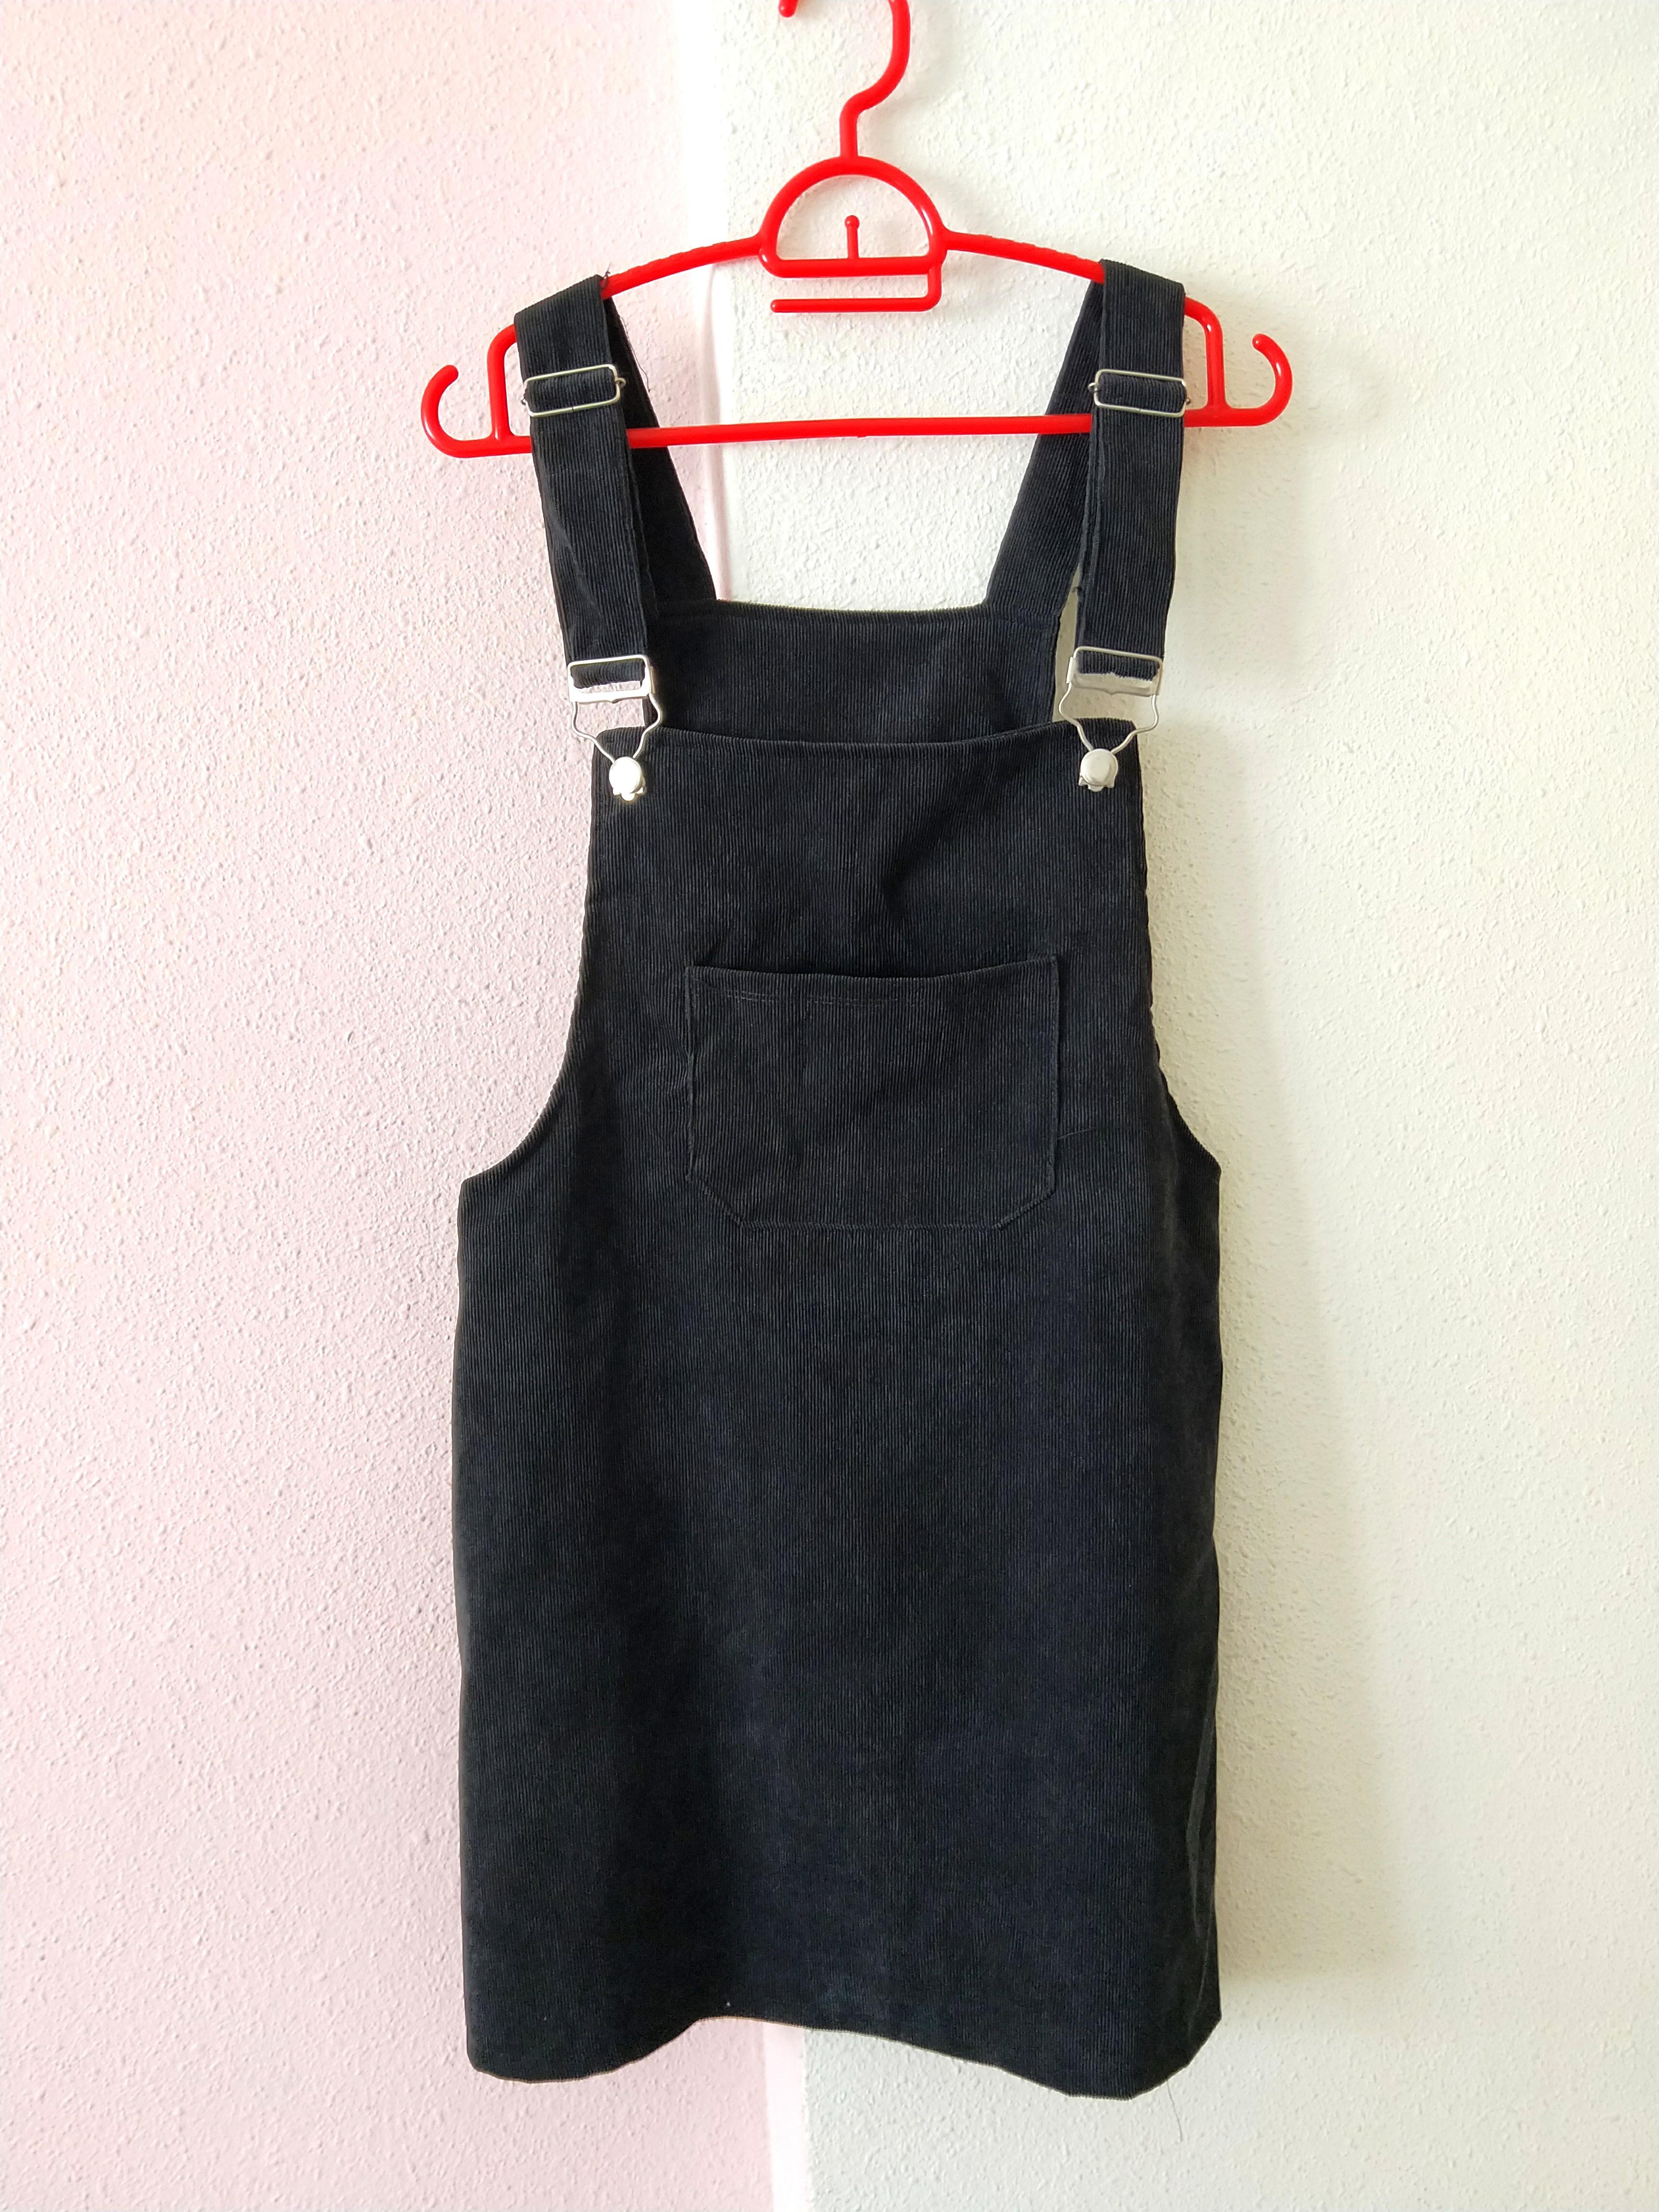 8a6b724737d Black Dungaree Dress  Pinafore